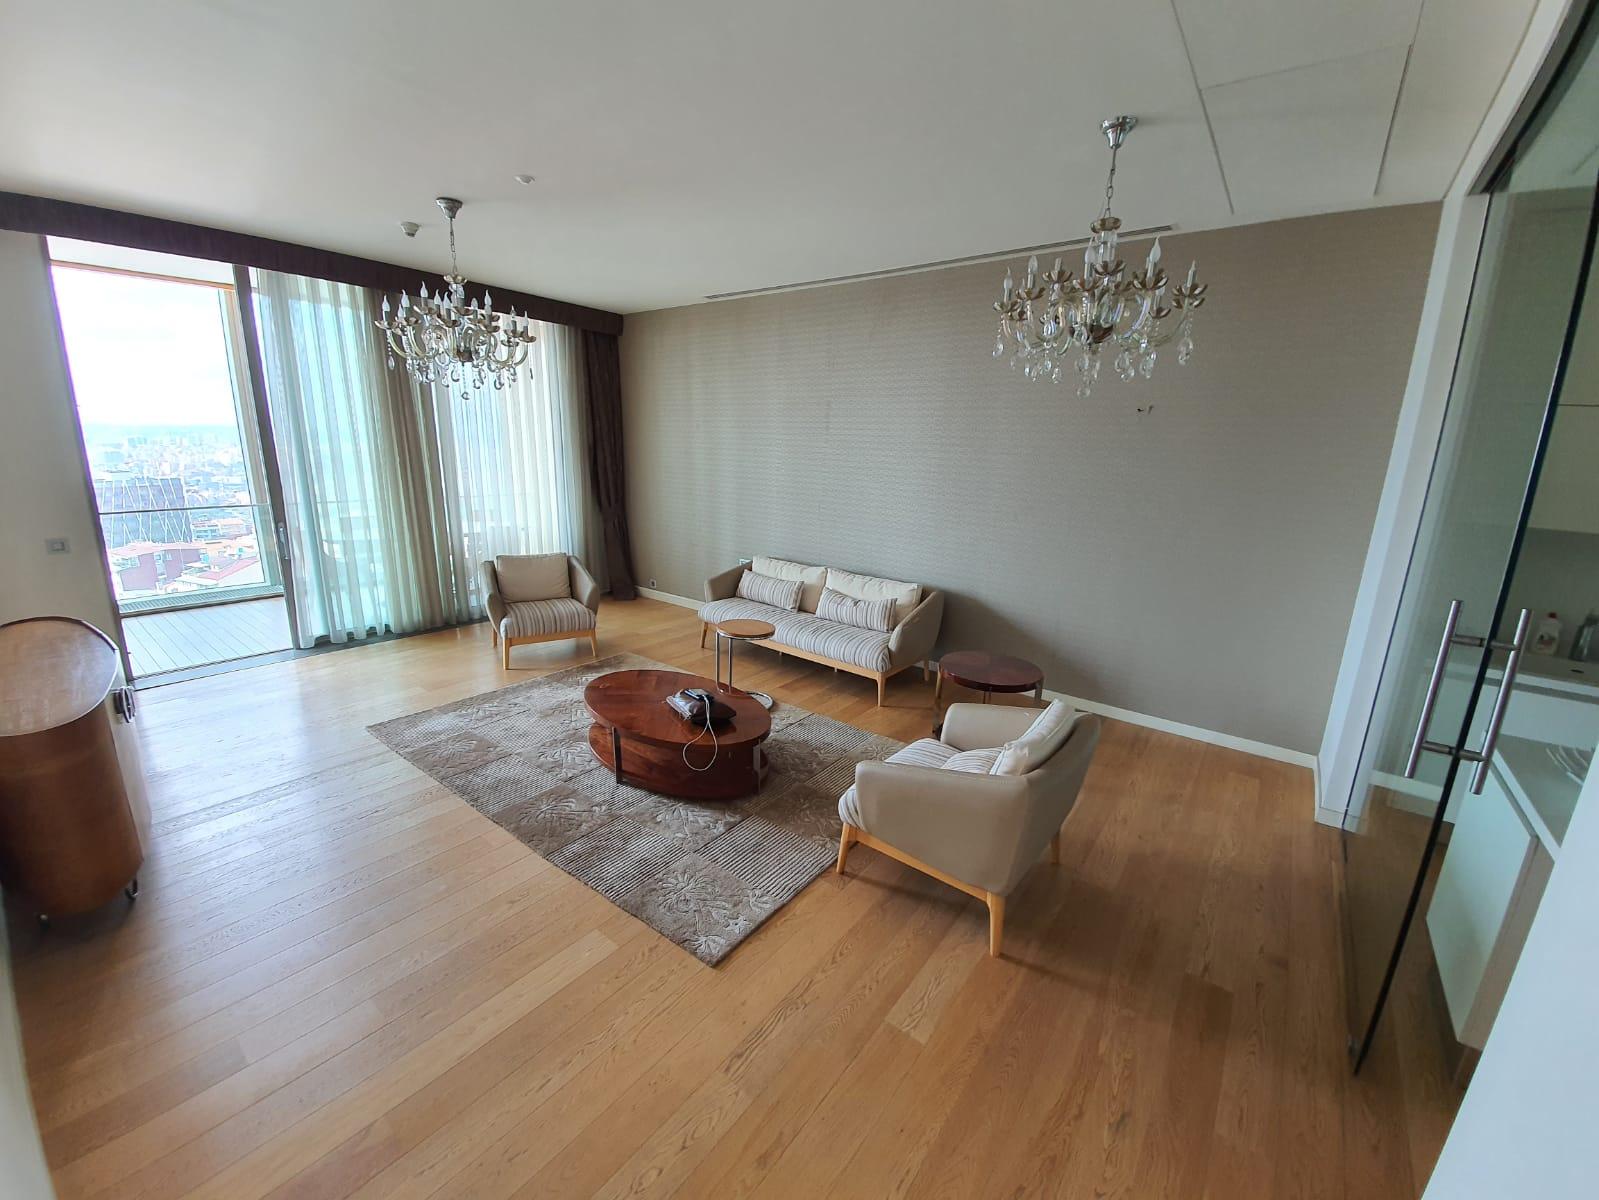 apartments-residence-sapphire-tower-11th-floor-001.jpg